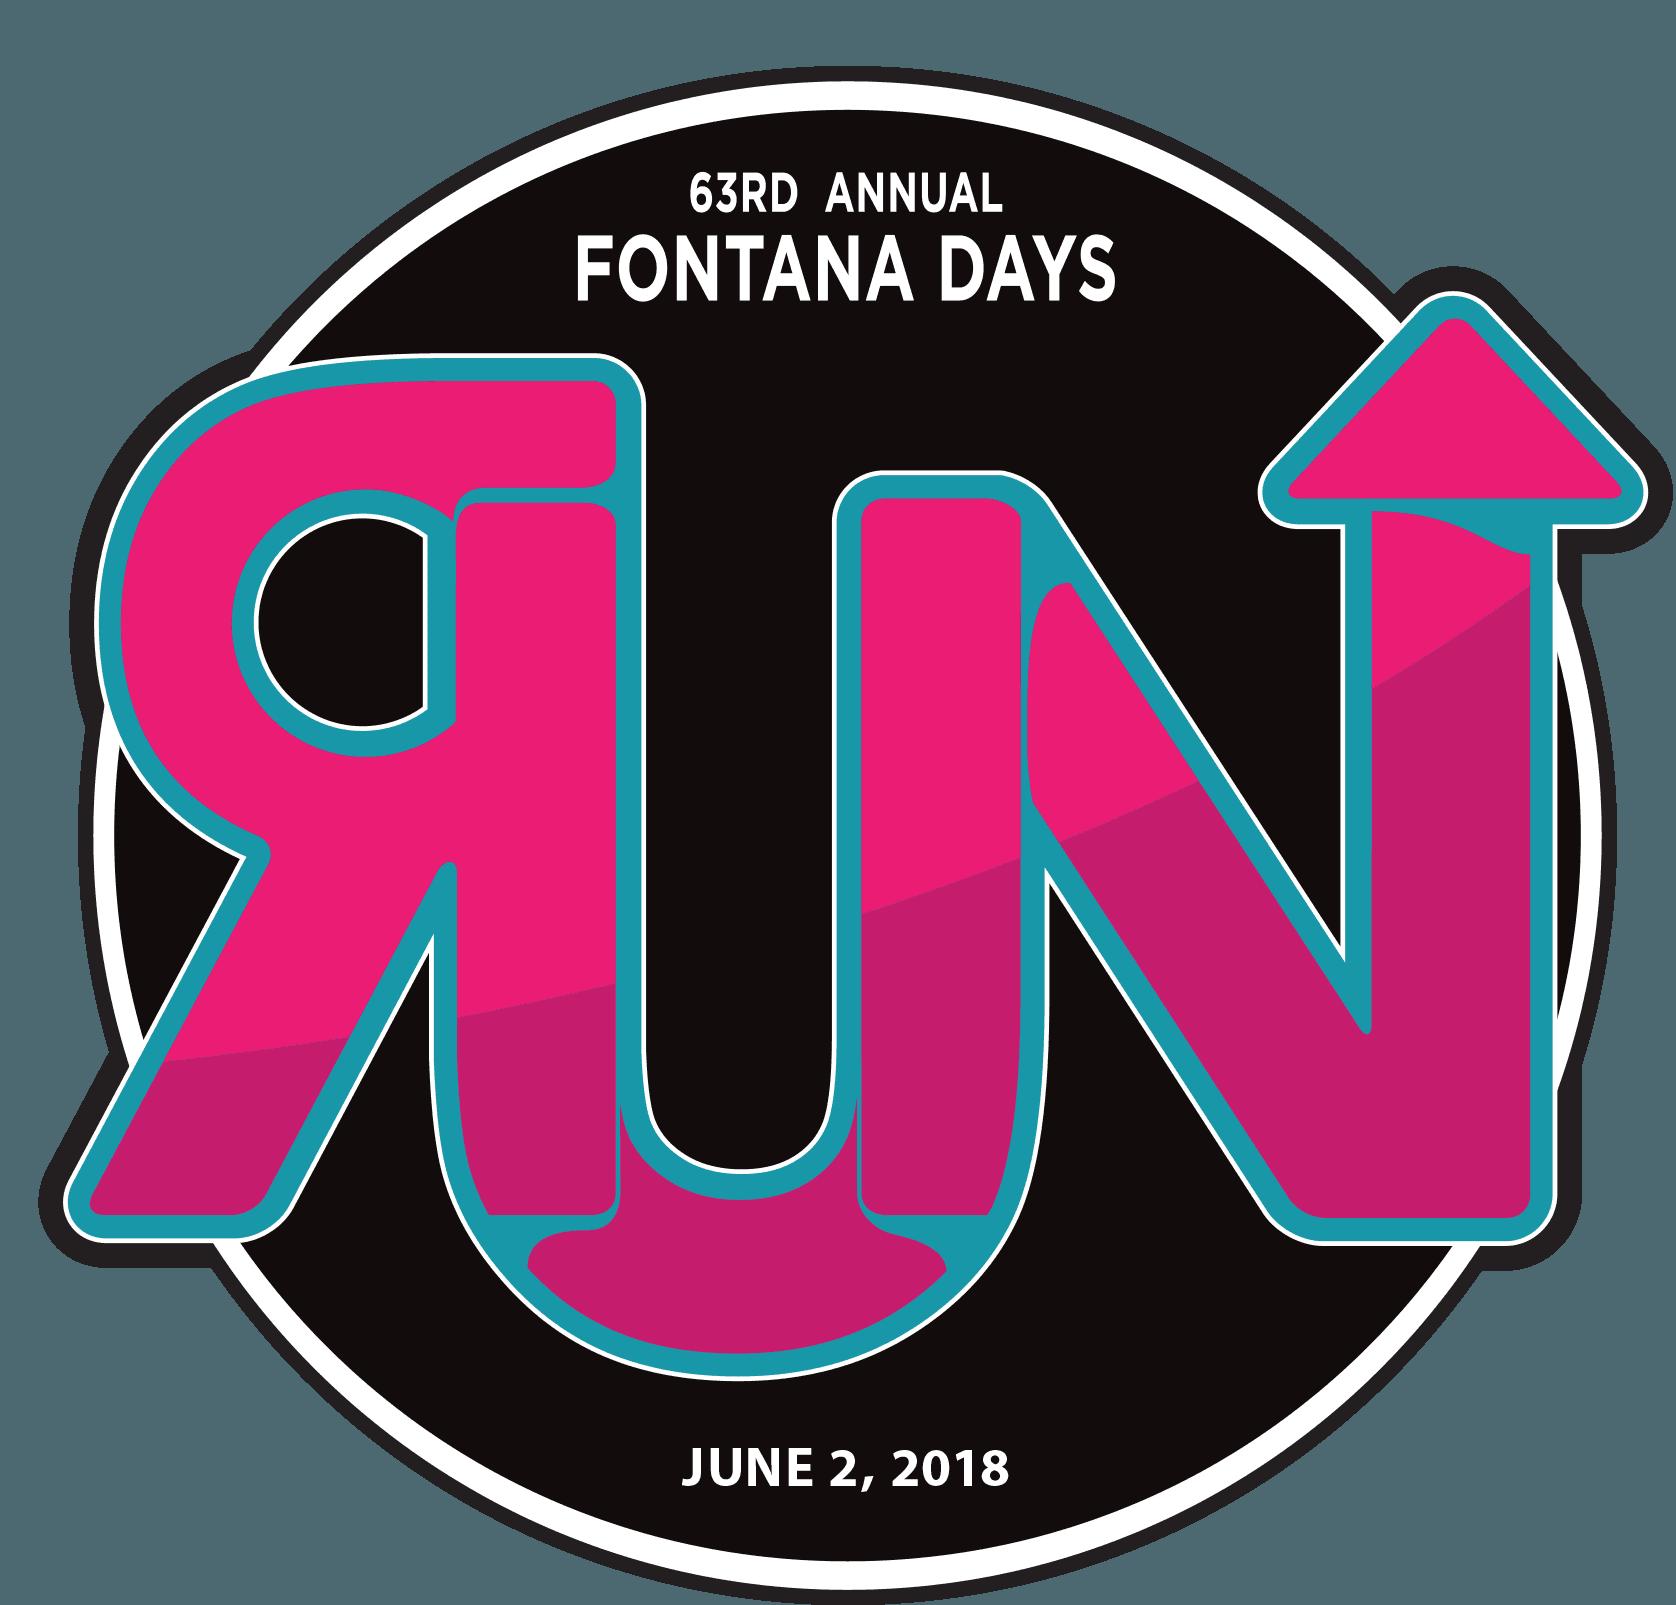 Family clipart marathon. Fontana days run june